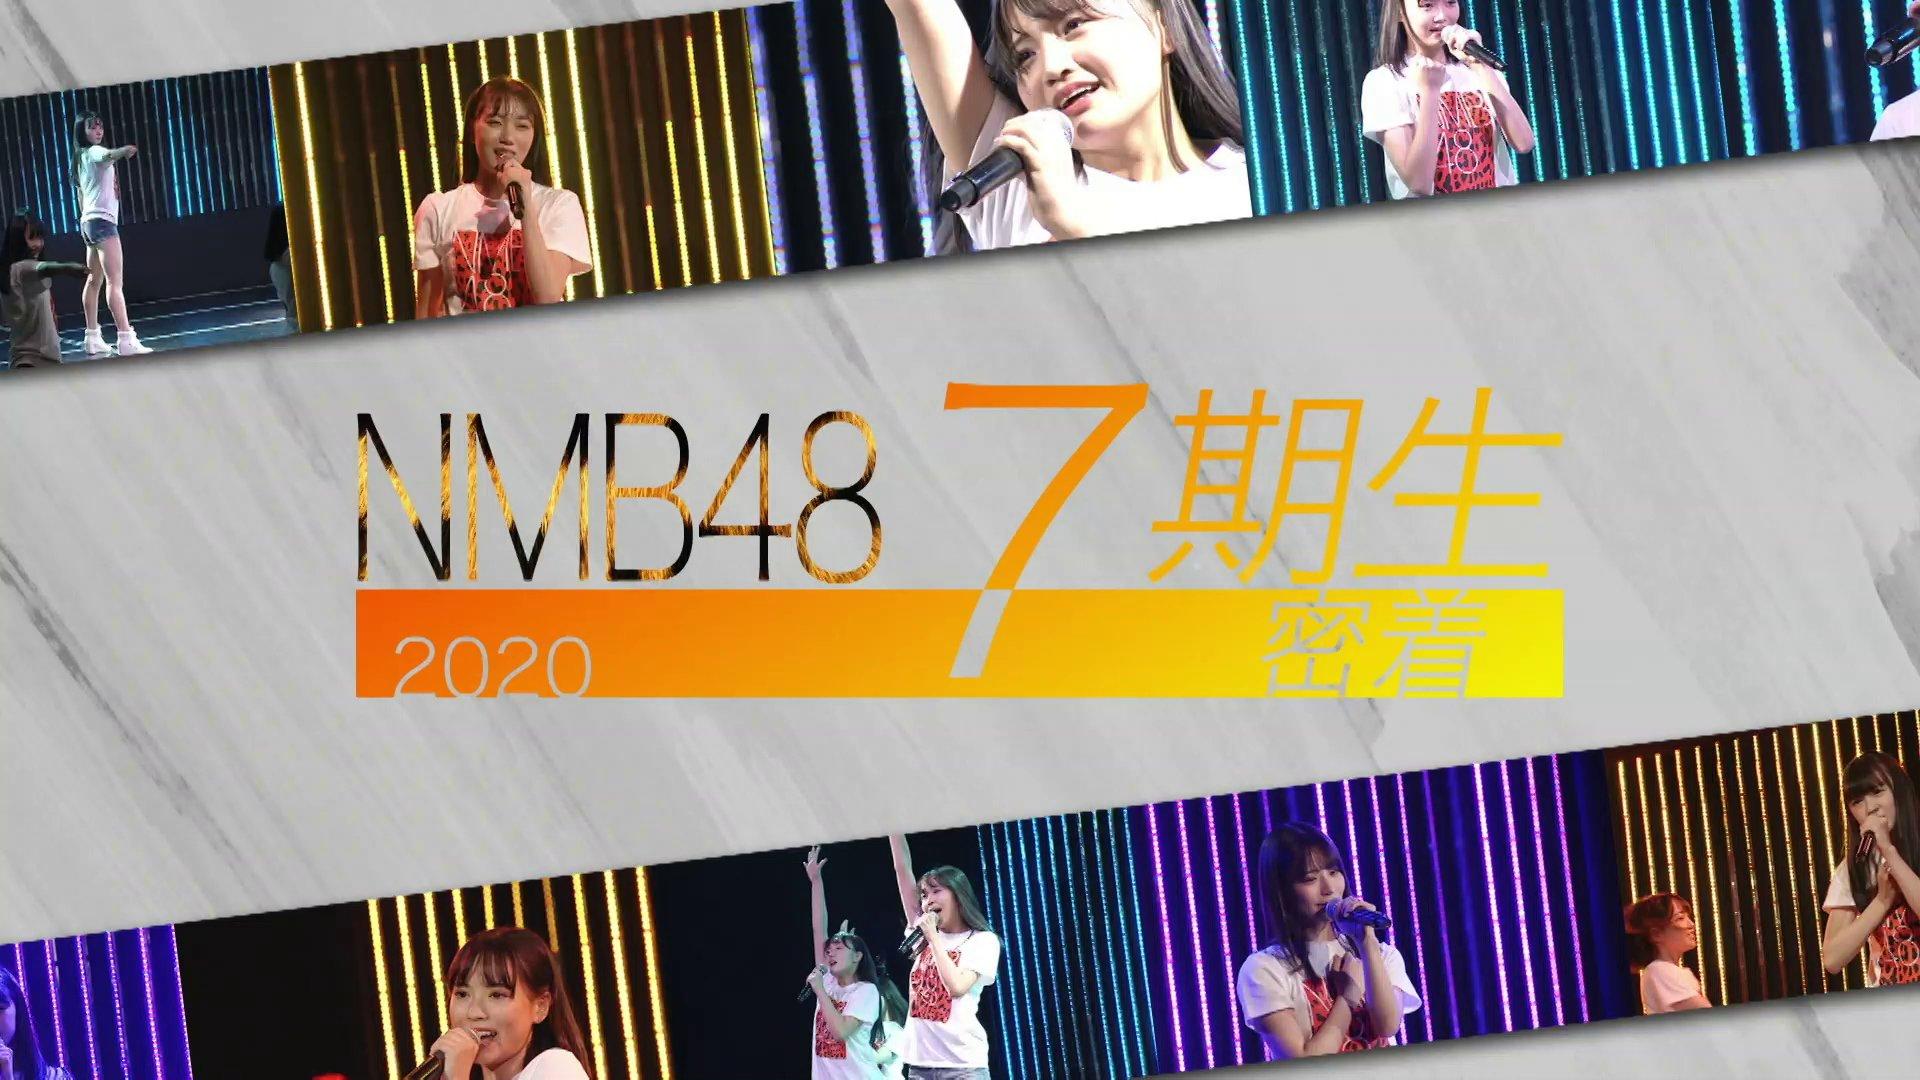 【NMB48】7期生密着番組がNMB48 Mobileで9/18から配信。You Tubeでも公開予定